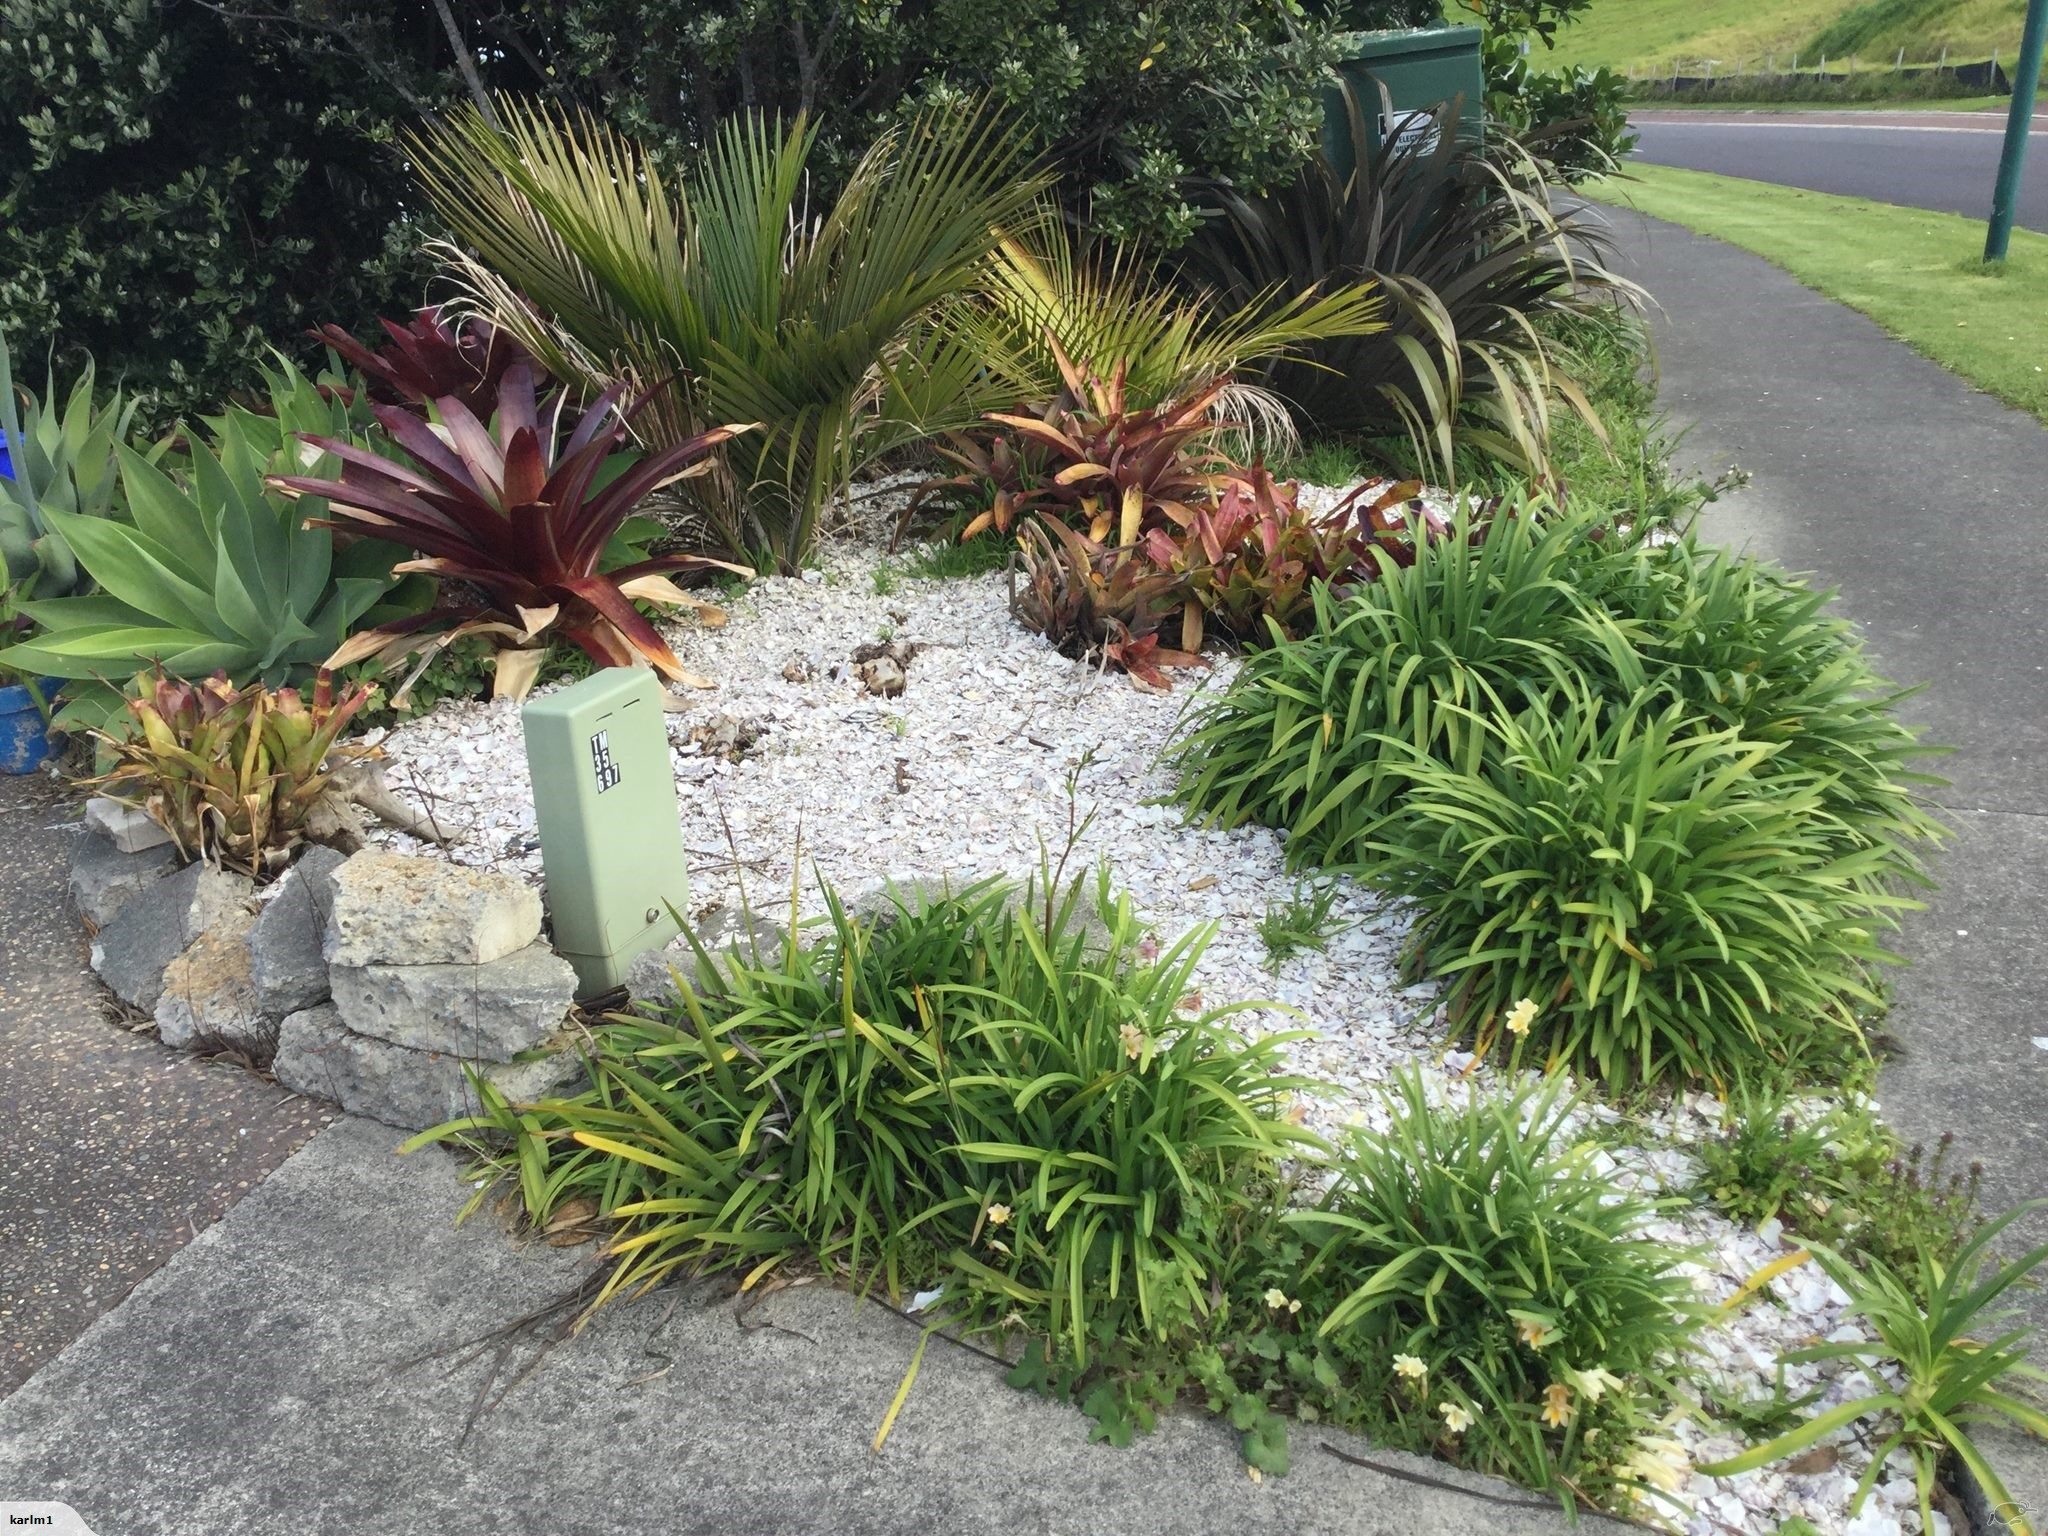 Crushed shell pathsgardens trade me home garden pinterest crushed shell pathsgardens trade me landscaping suppliesgarden workwithnaturefo